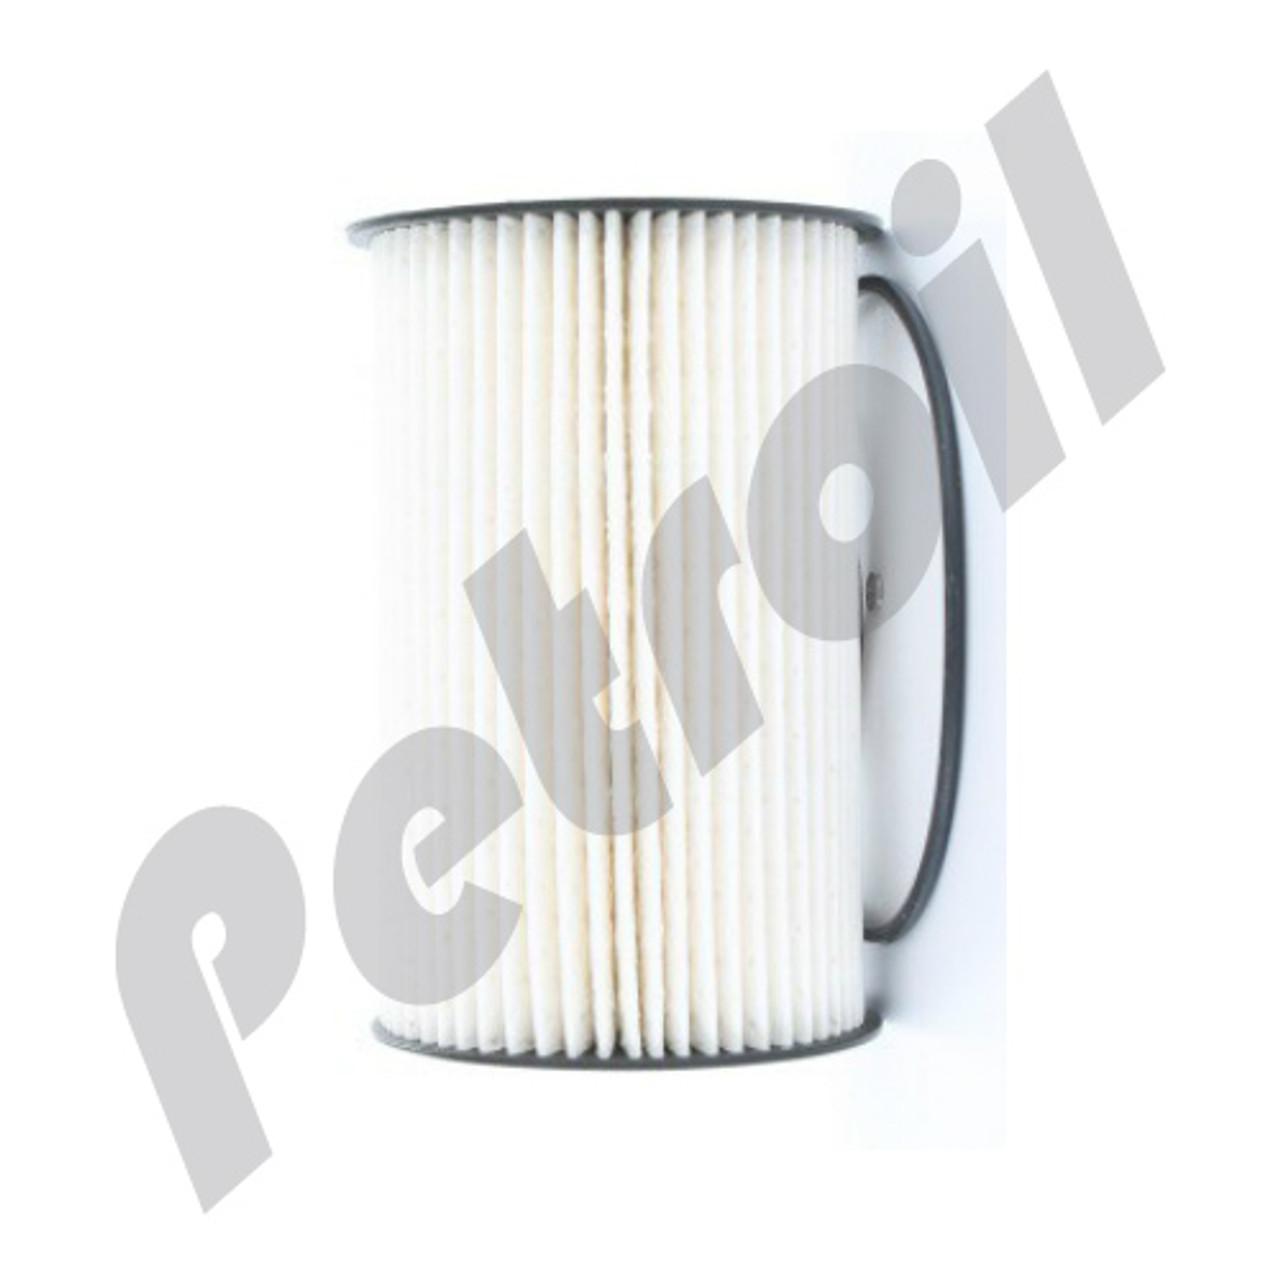 fs19684e fleetguard fuel filter cartridge type international truck 4300  dt466 1842638c92 p550657 33719 pf7779